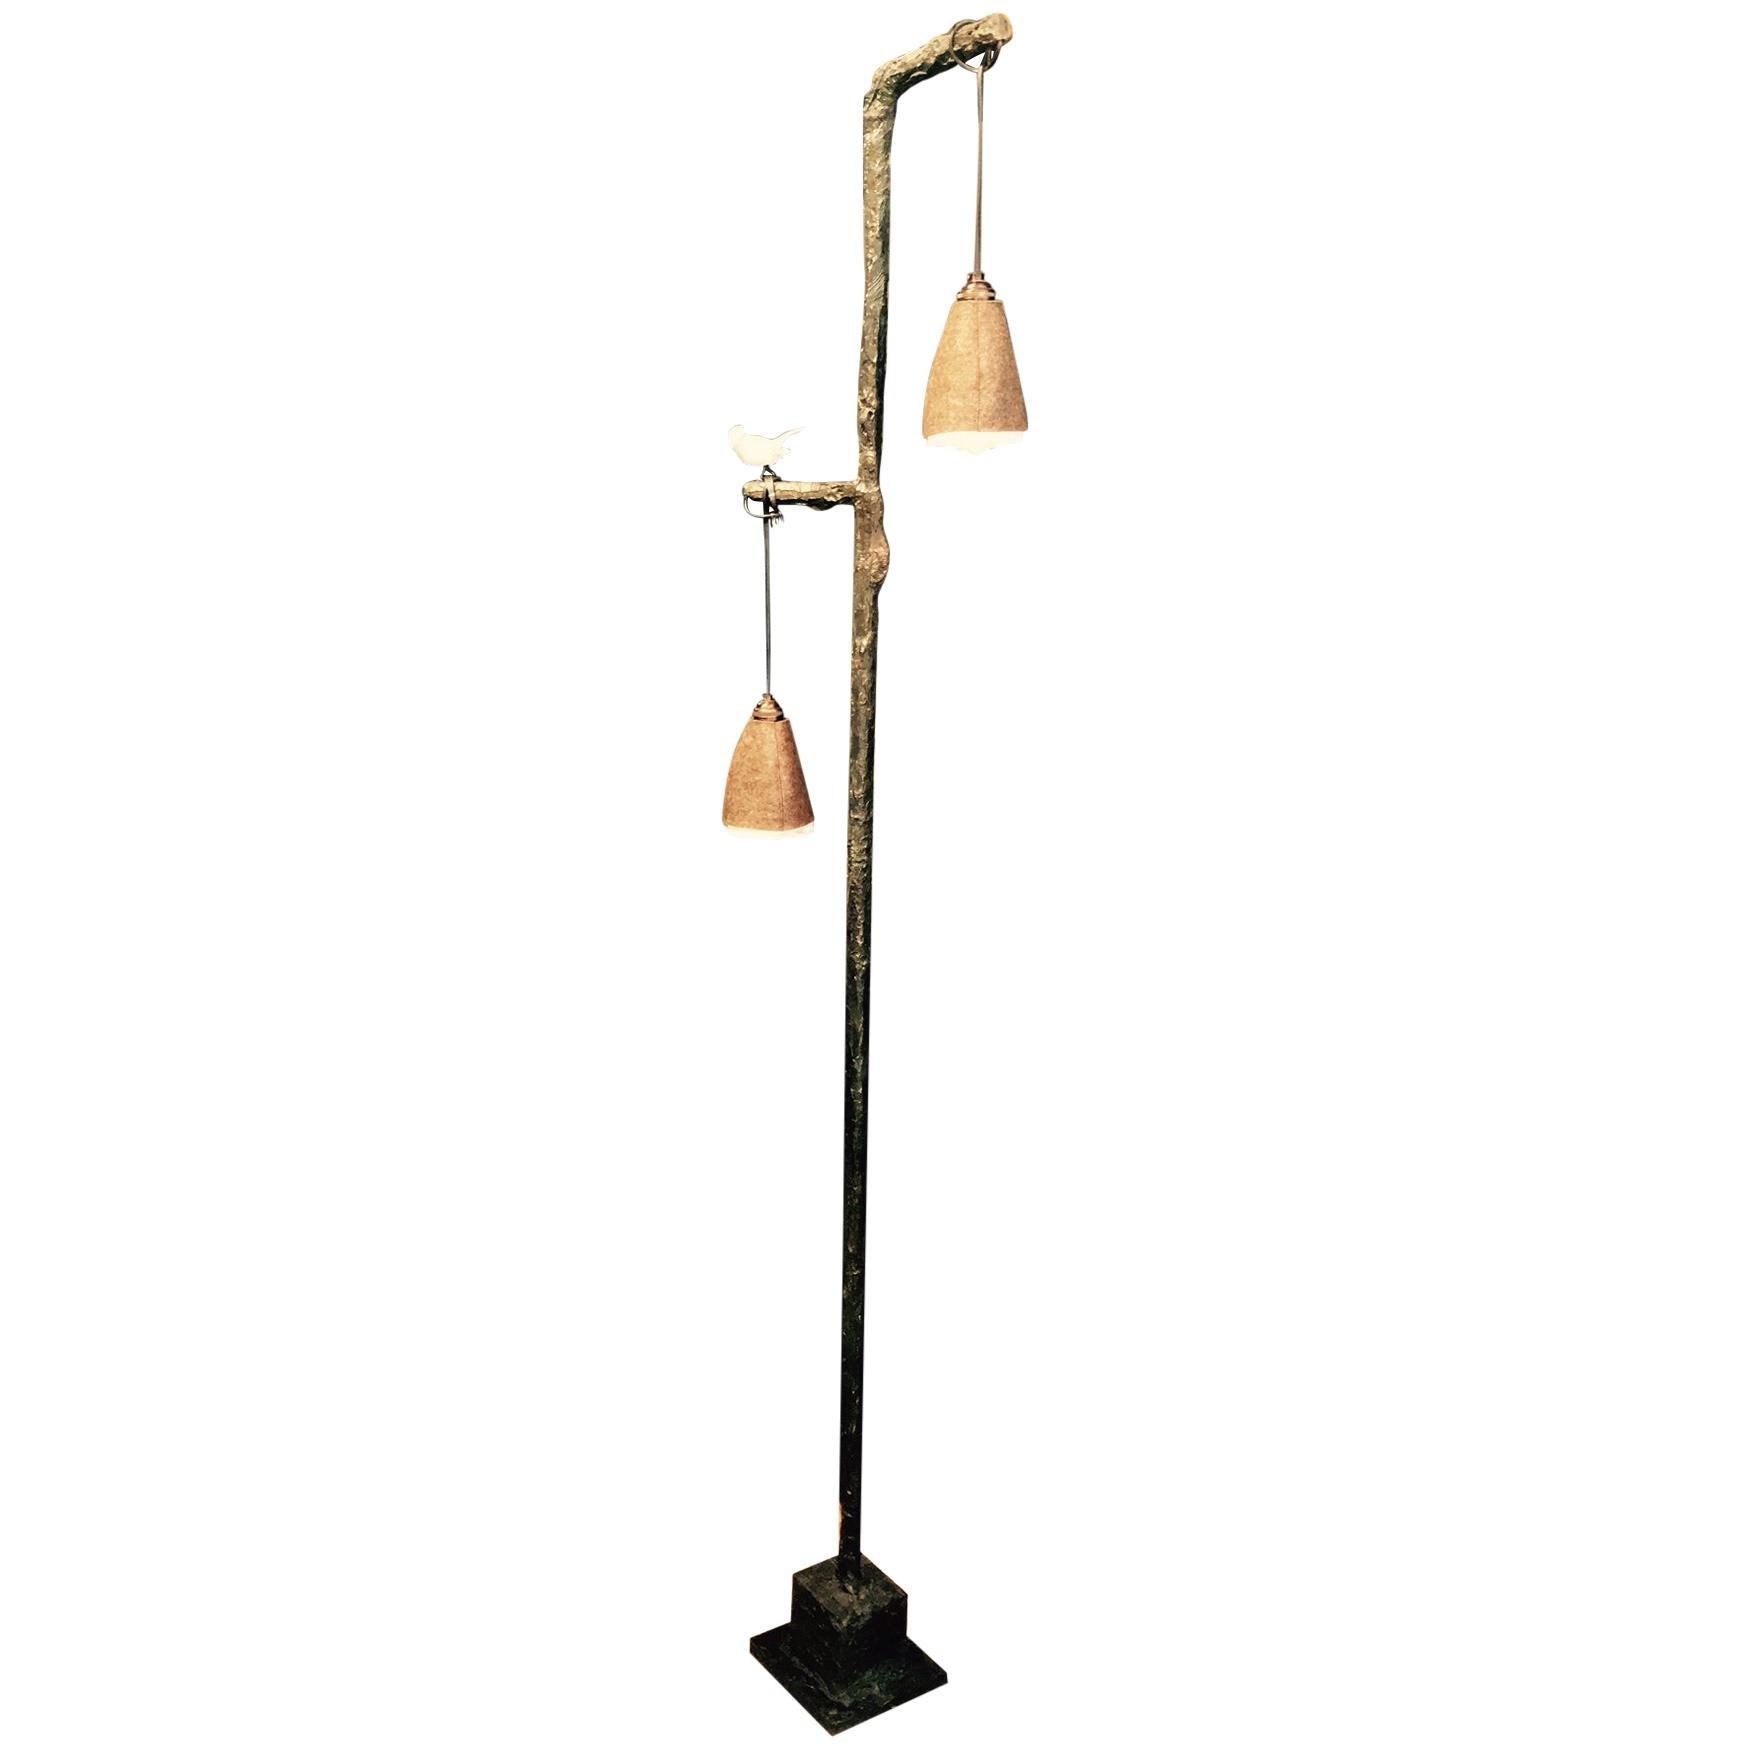 Bronze Floor Lamp by Thierry Dreyfus